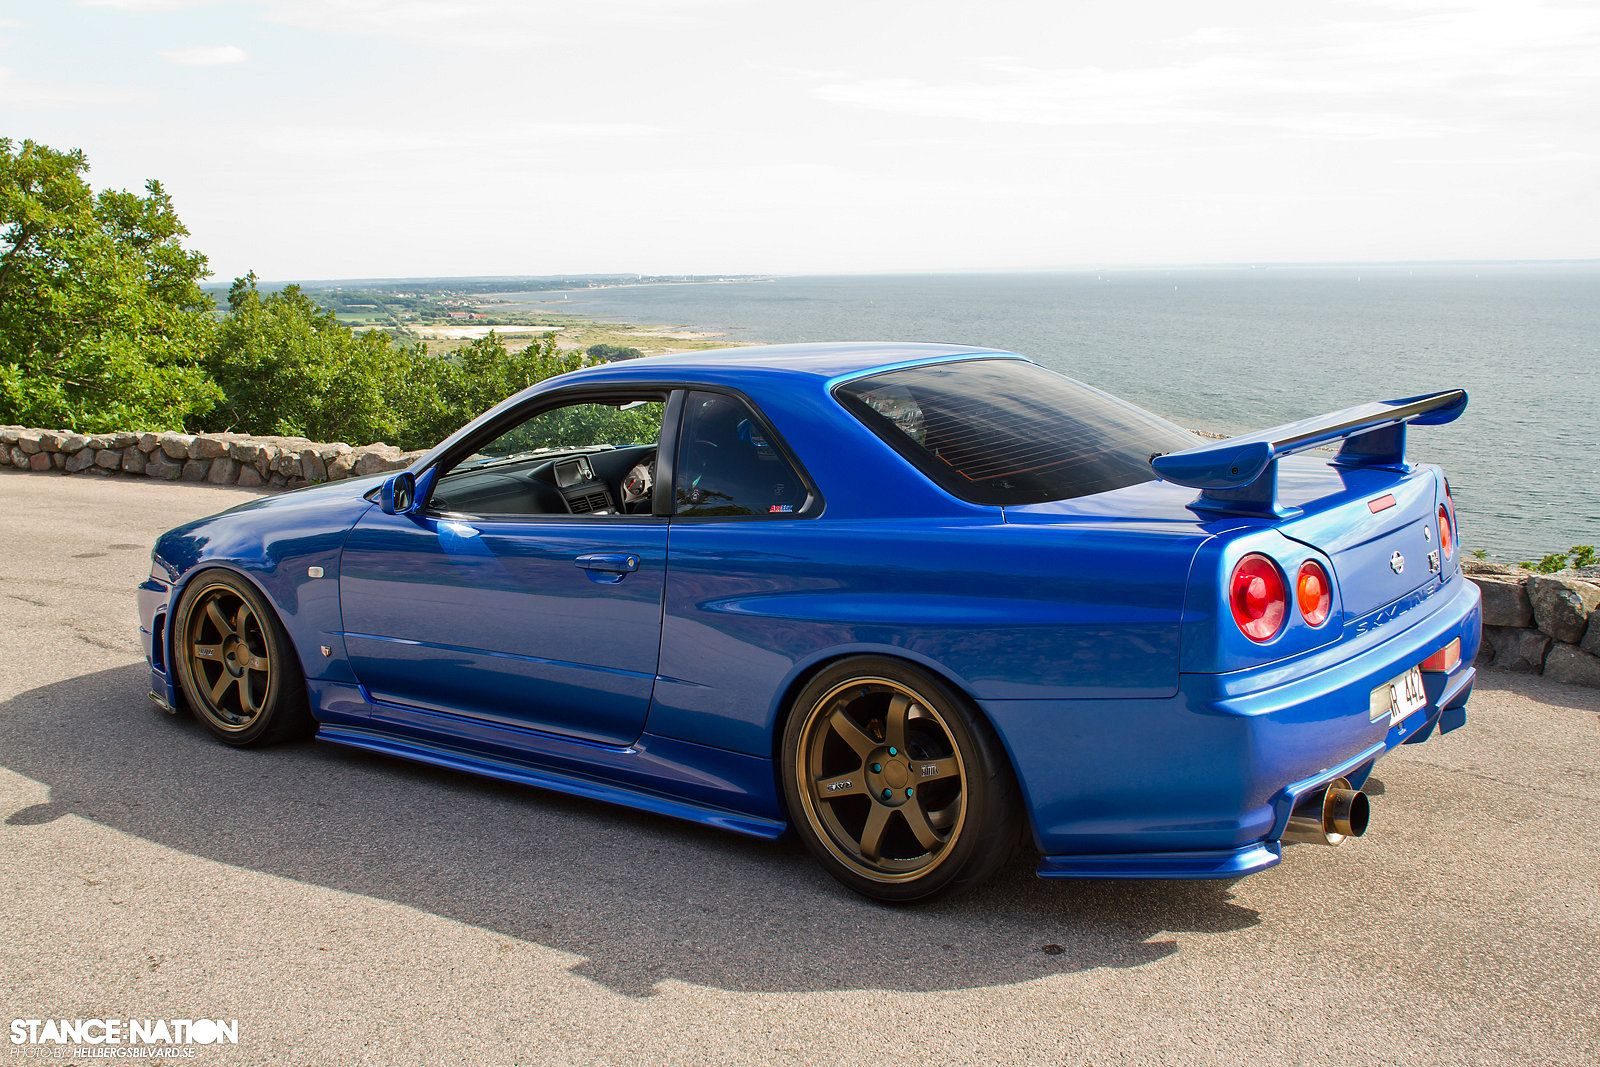 Exceptional Nissan Skyline GTR R34 Spec II